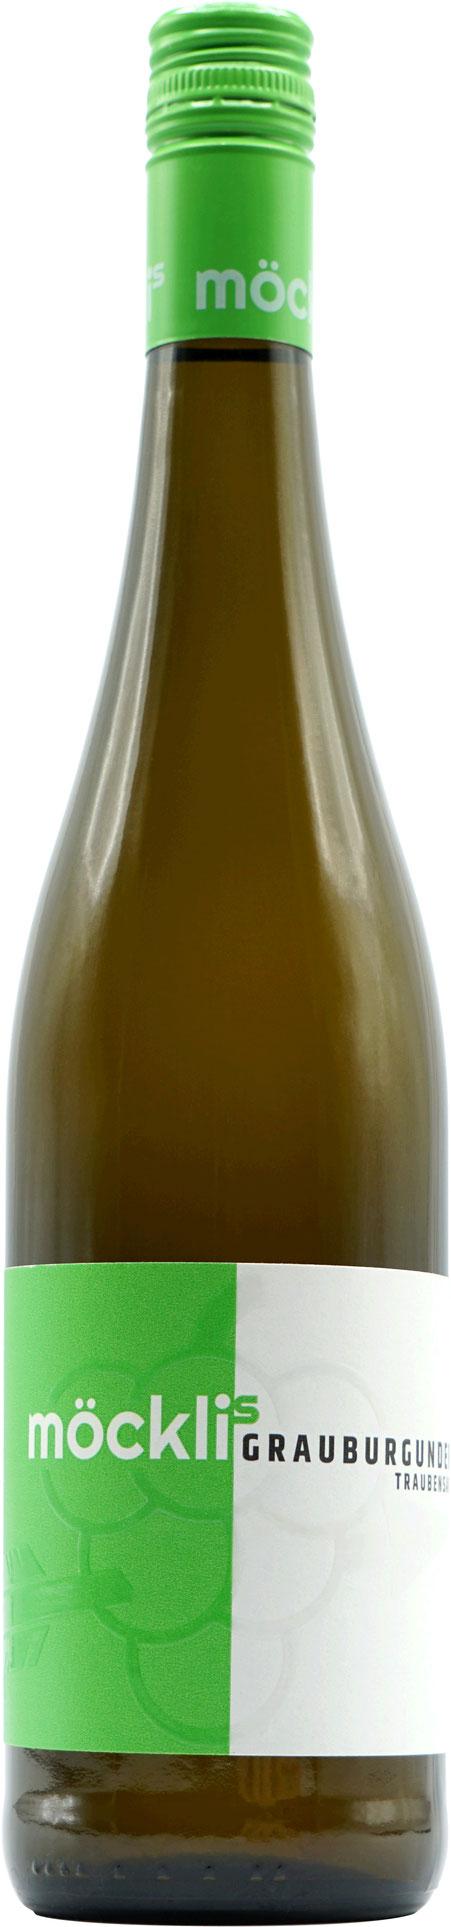 Grauburgunder Traubensaft Saft sortenreiner Saft alkoholfrei Gourmetsaft